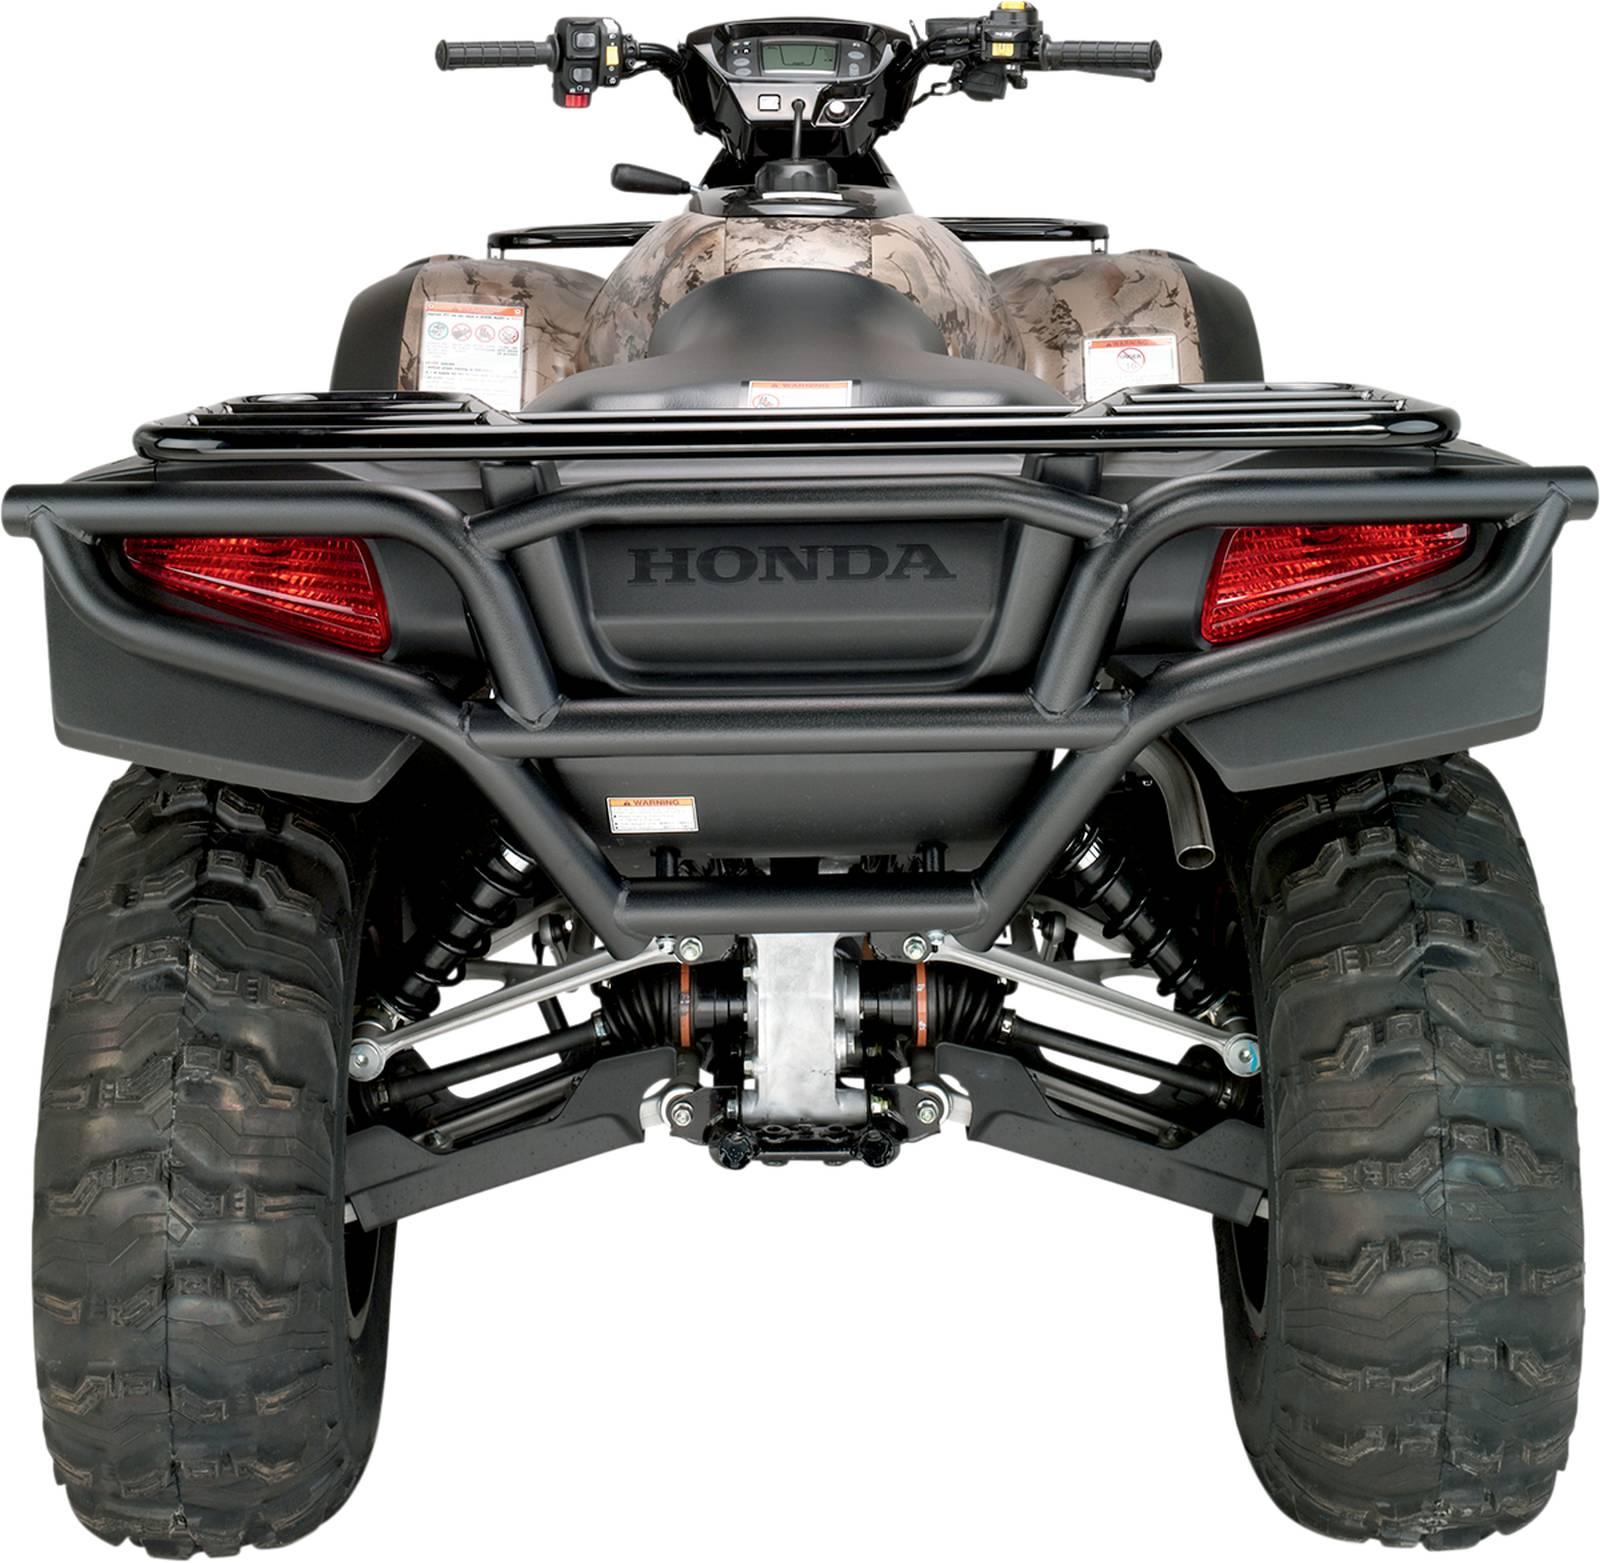 Similiar Honda Rincon Accessories Keywords Rubicon 650 Wiring Diagram New Moose Utility 680 03 14 Rear Bumper